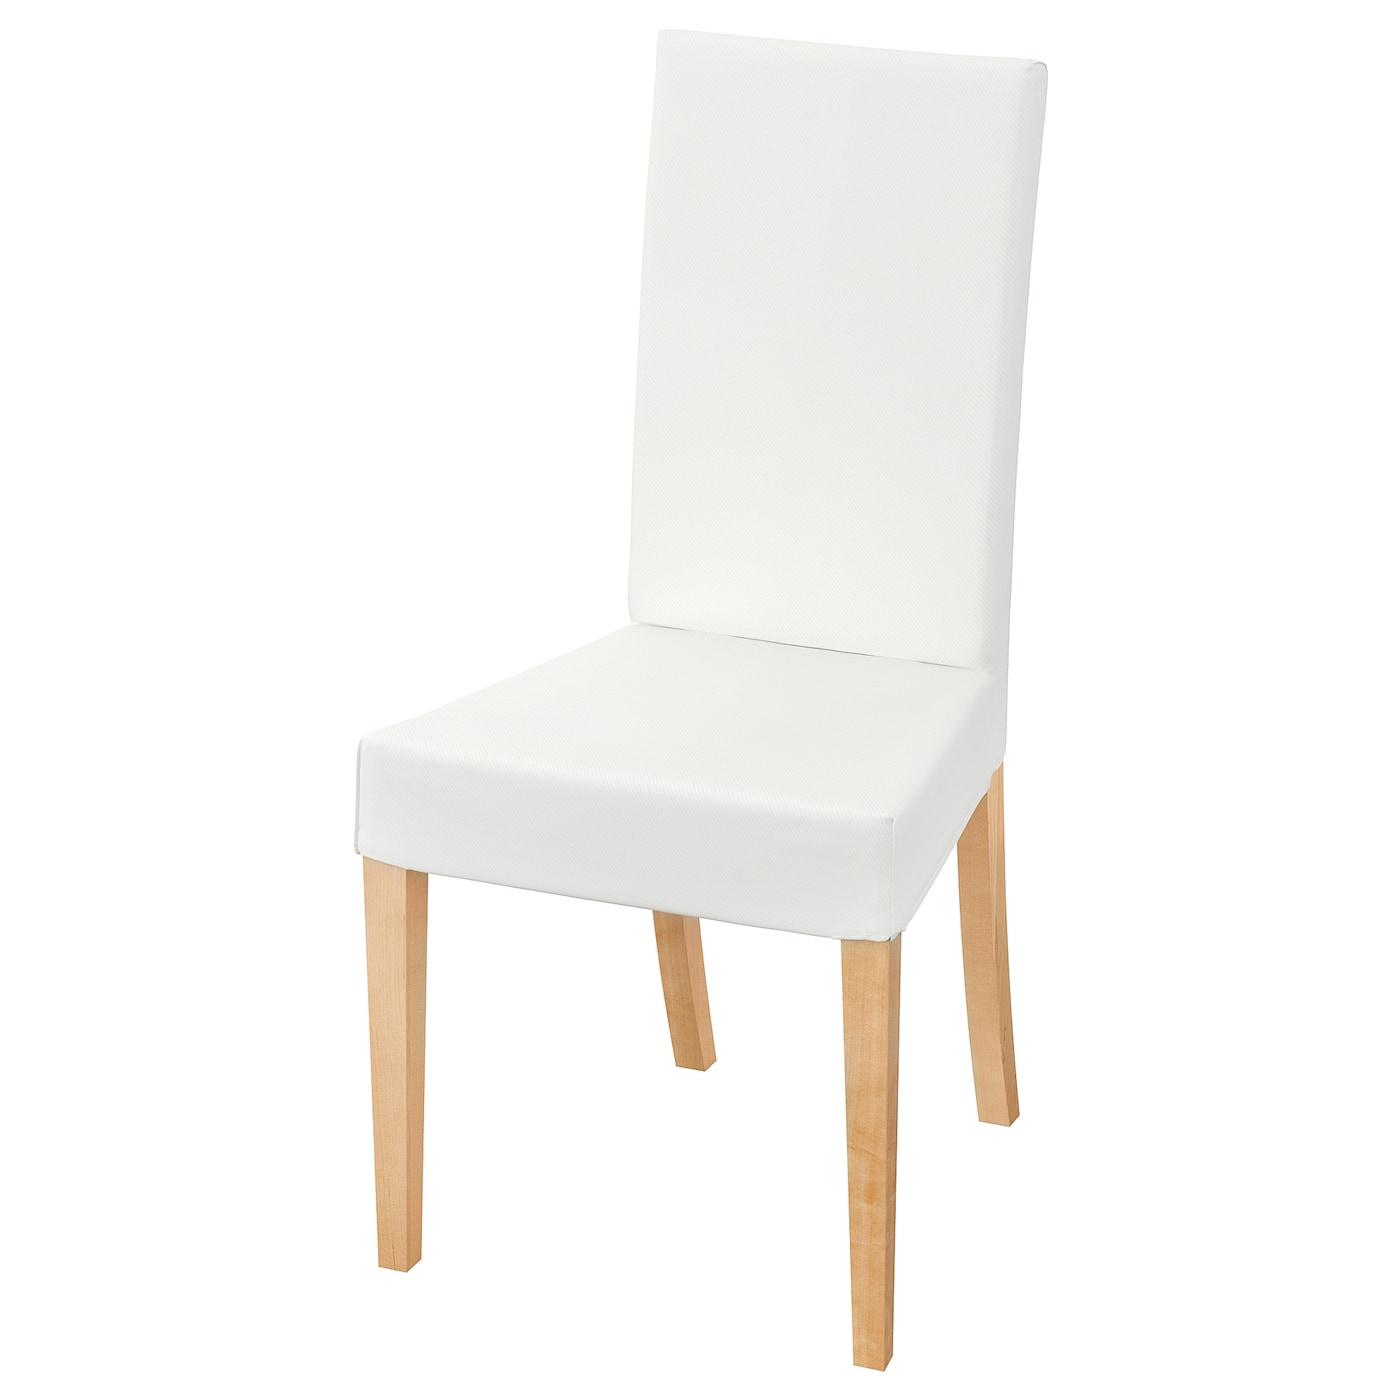 HARRY Stol, birk, Blekinge hvid IKEA